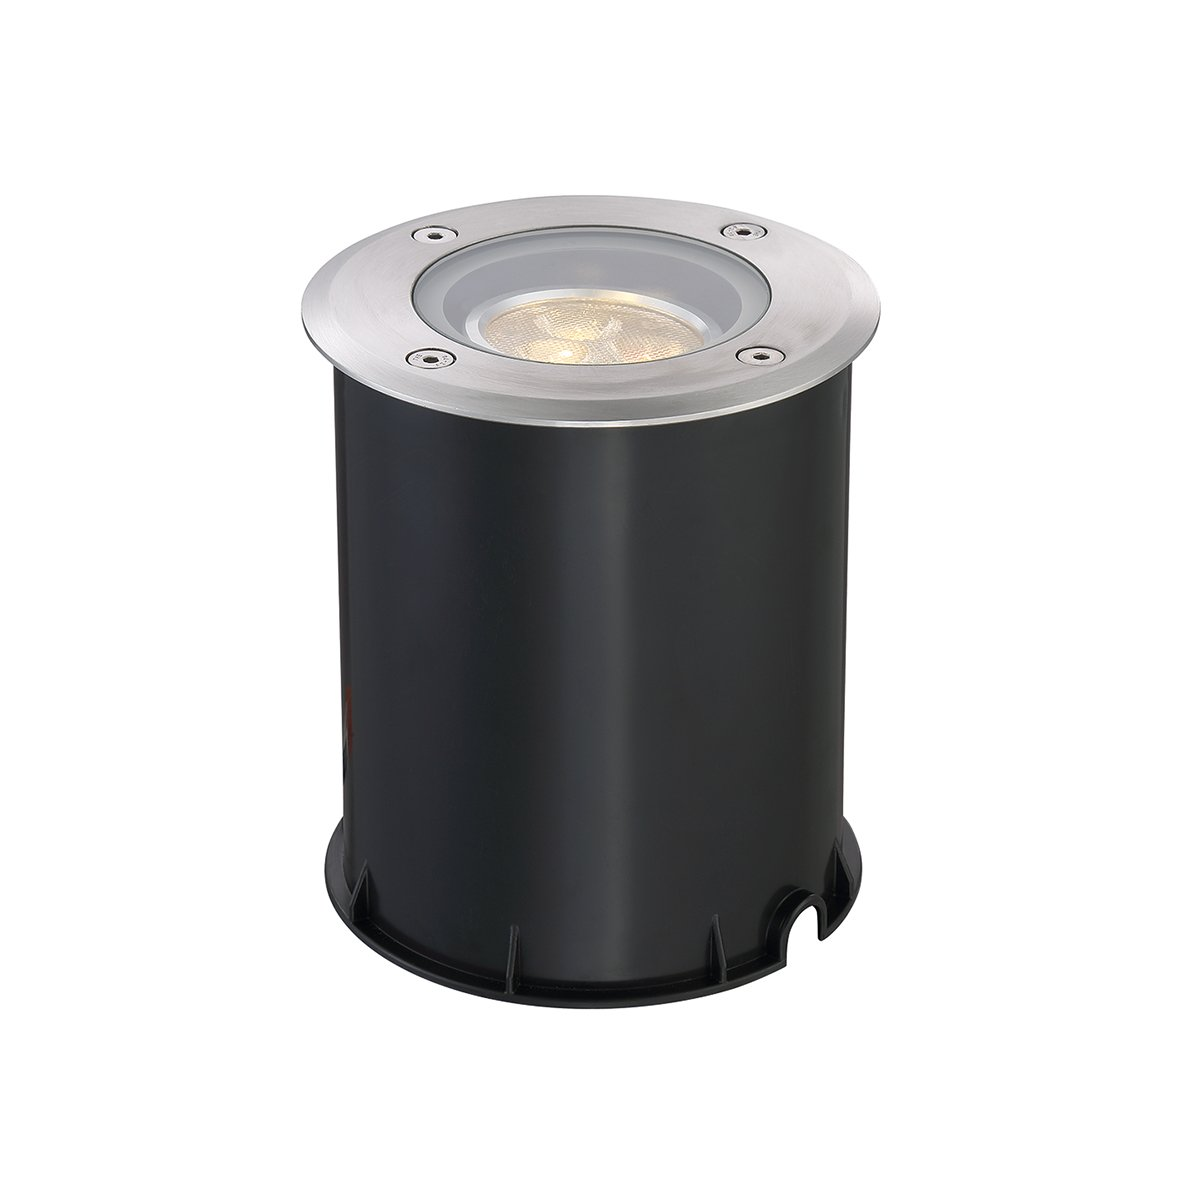 Eurofase 31595-018 Inground Outdoor Round LED, Stainless Steel